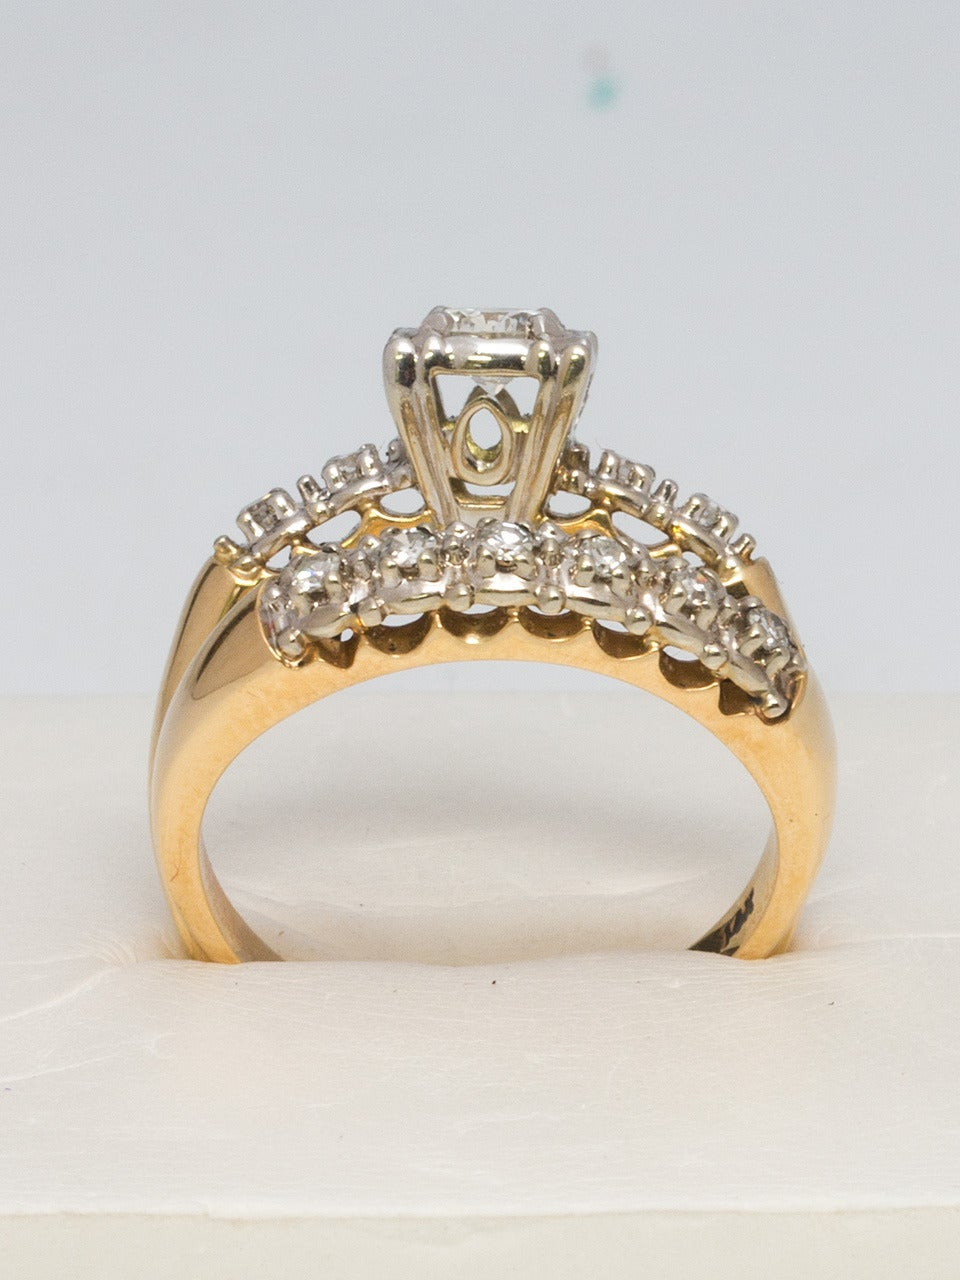 1950s Yellow Gold And Diamond Wedding Ring Set At 1stdibs